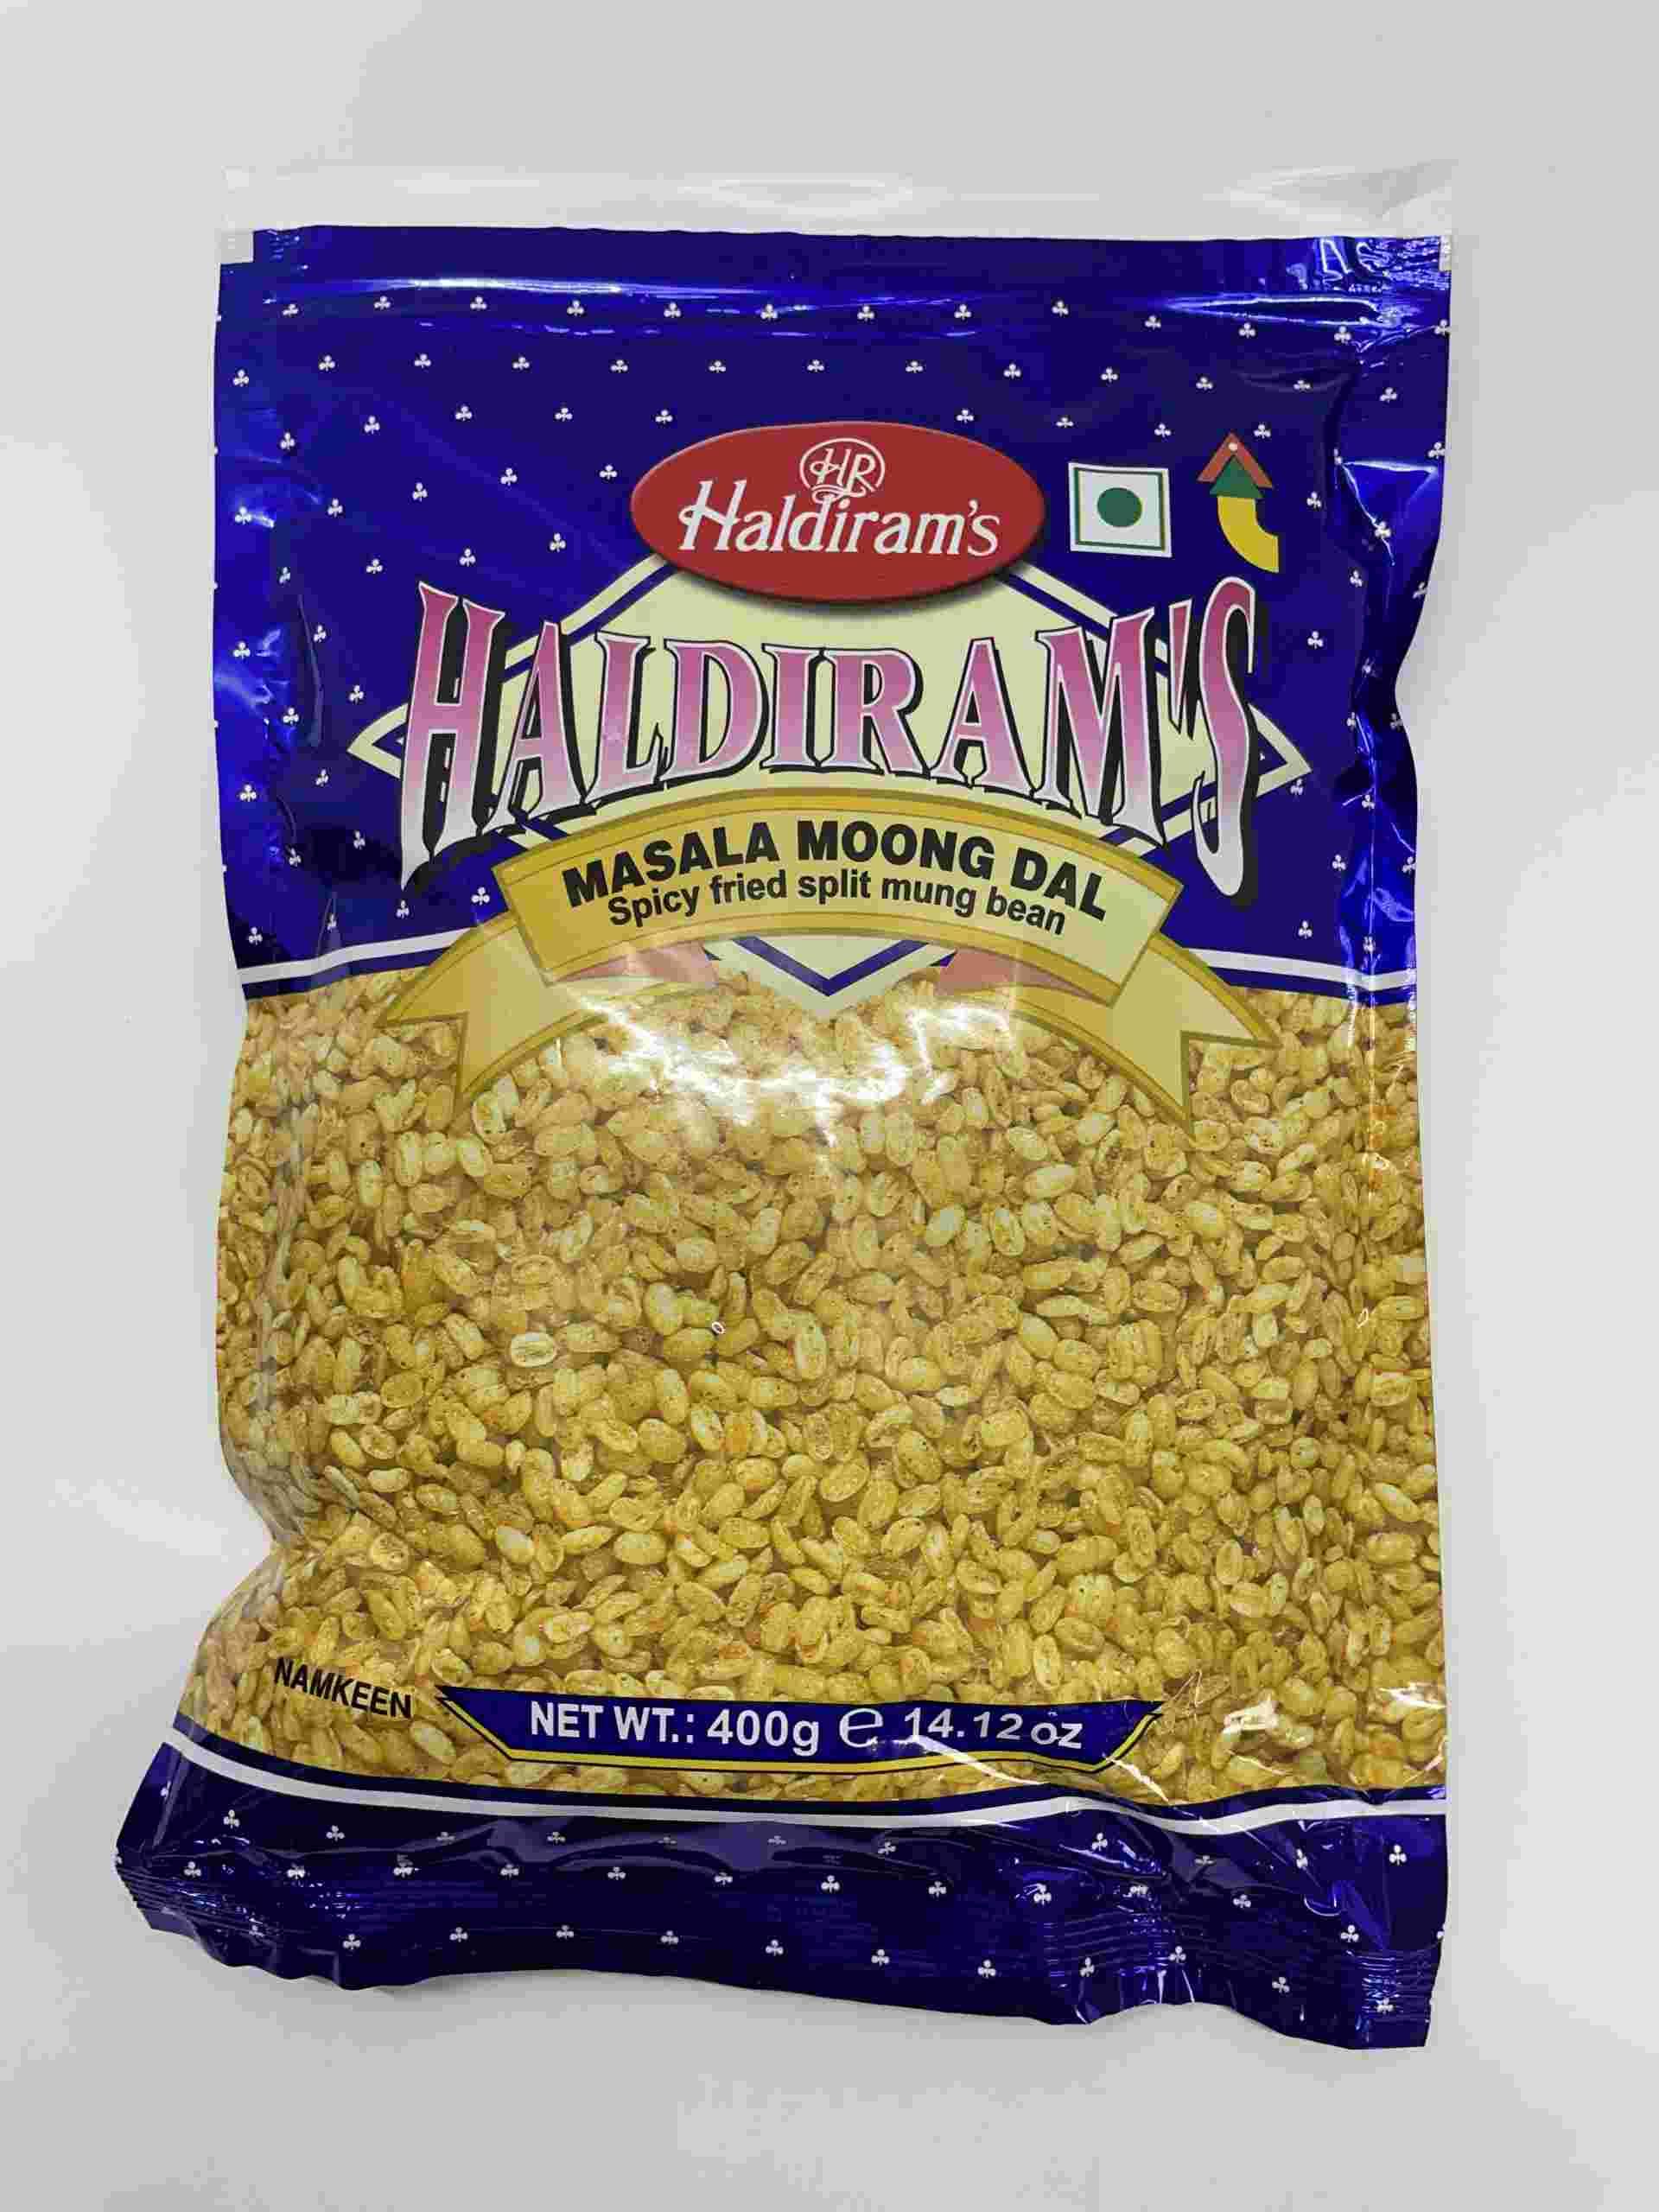 Haldiram's MASALA MOONG DAL